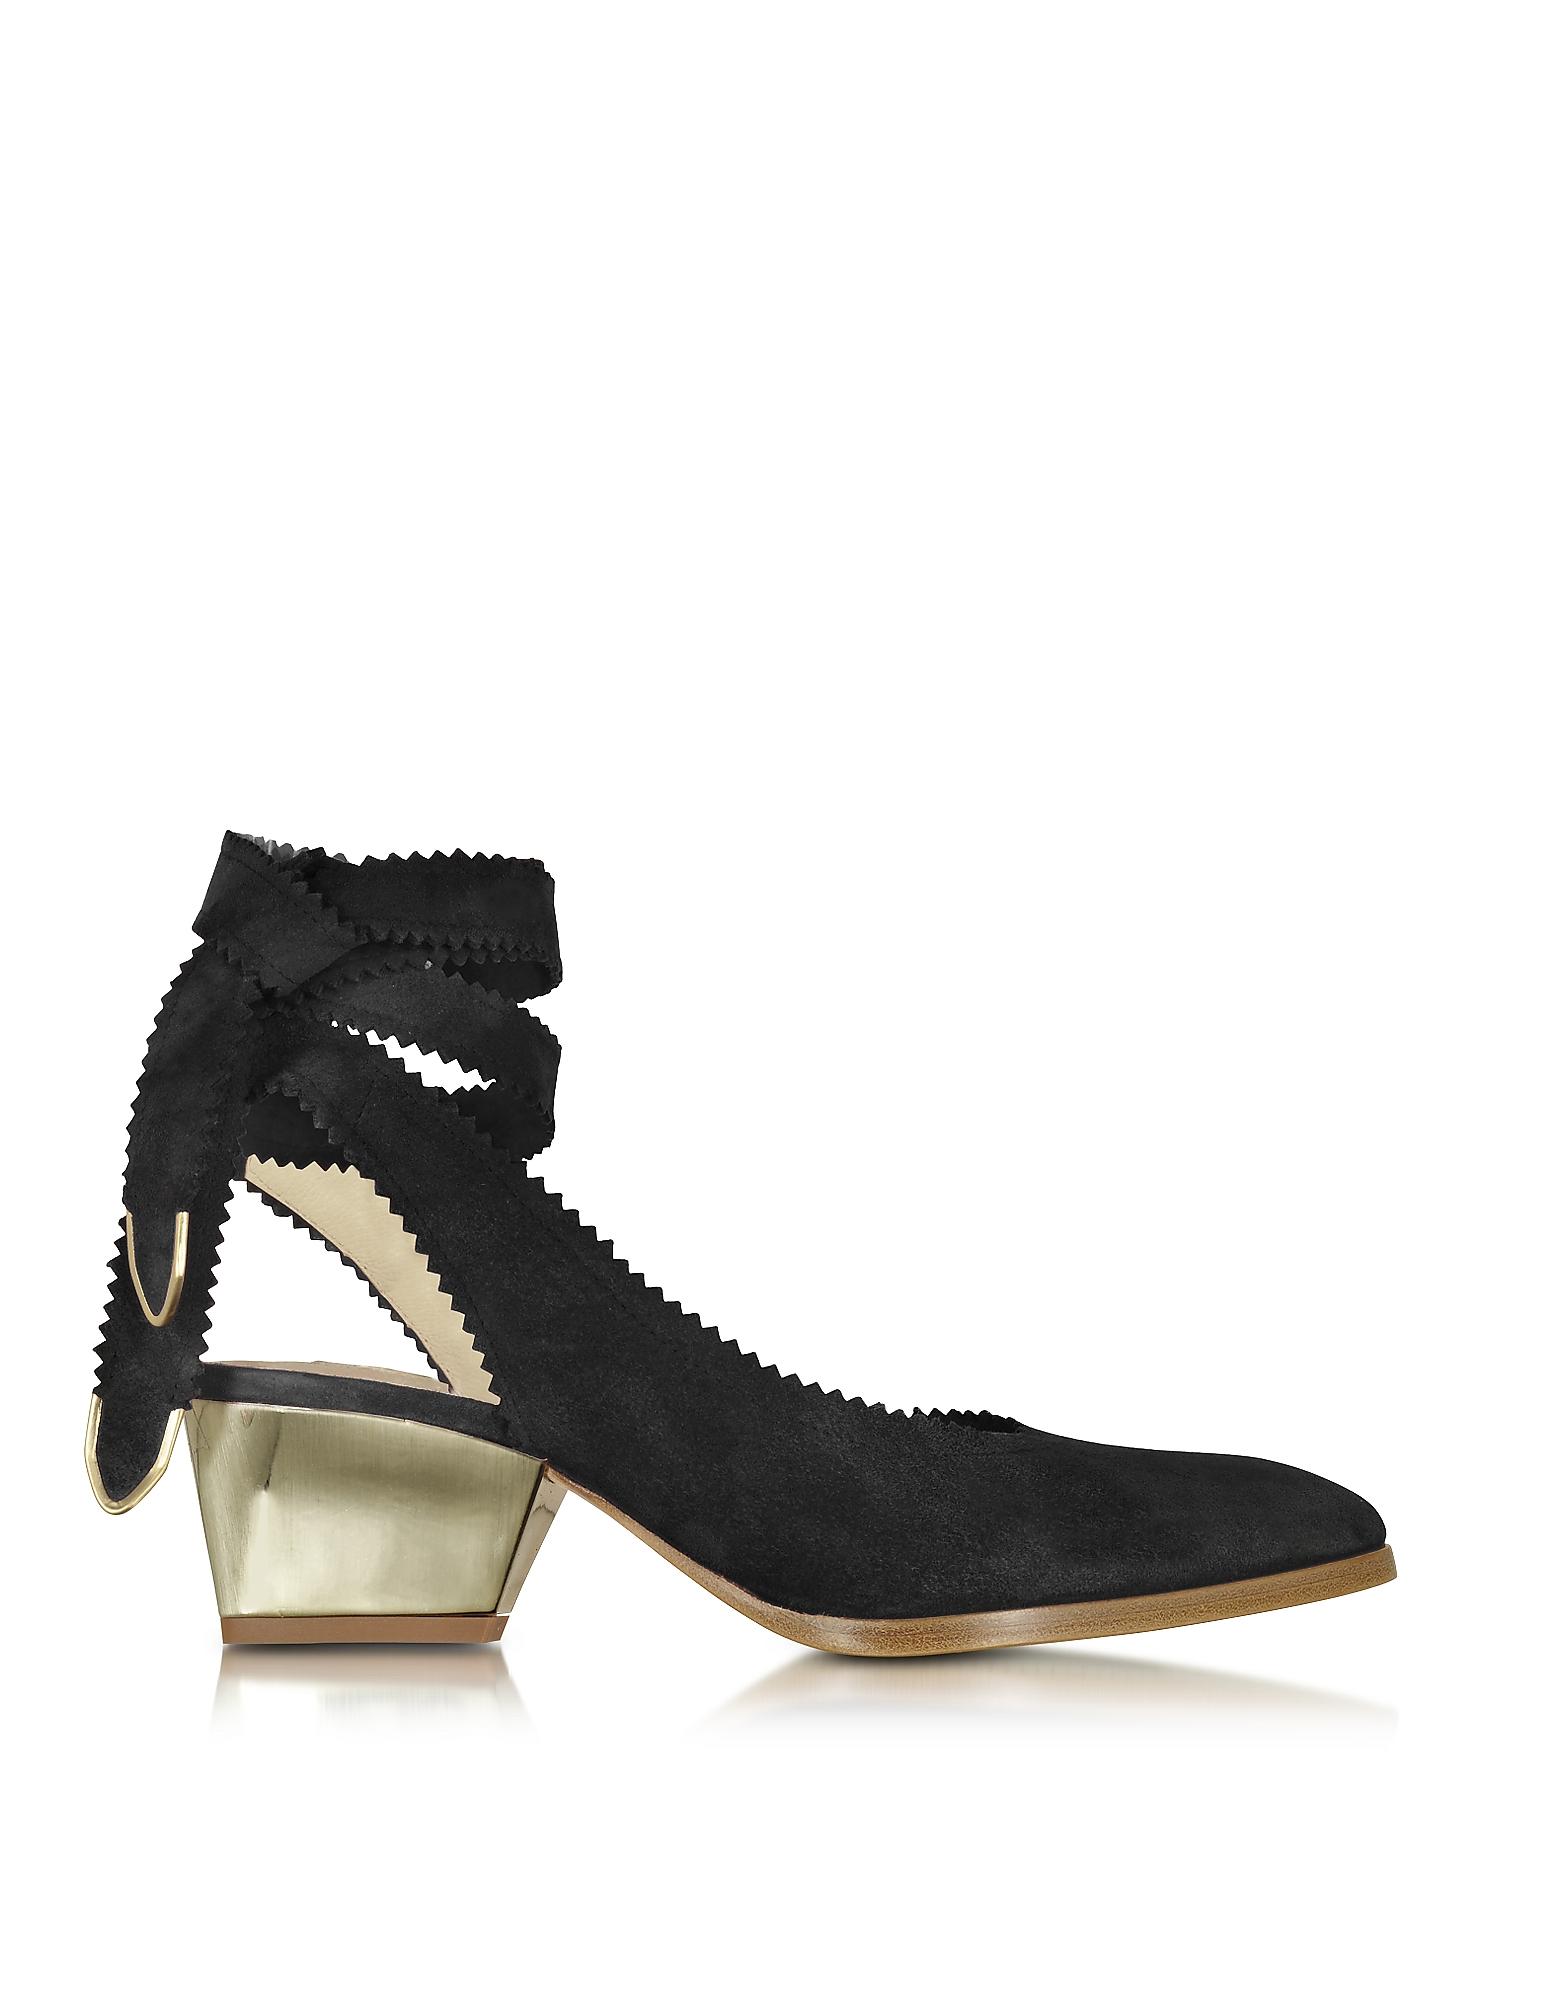 Elegance Shoes Black Red Suede